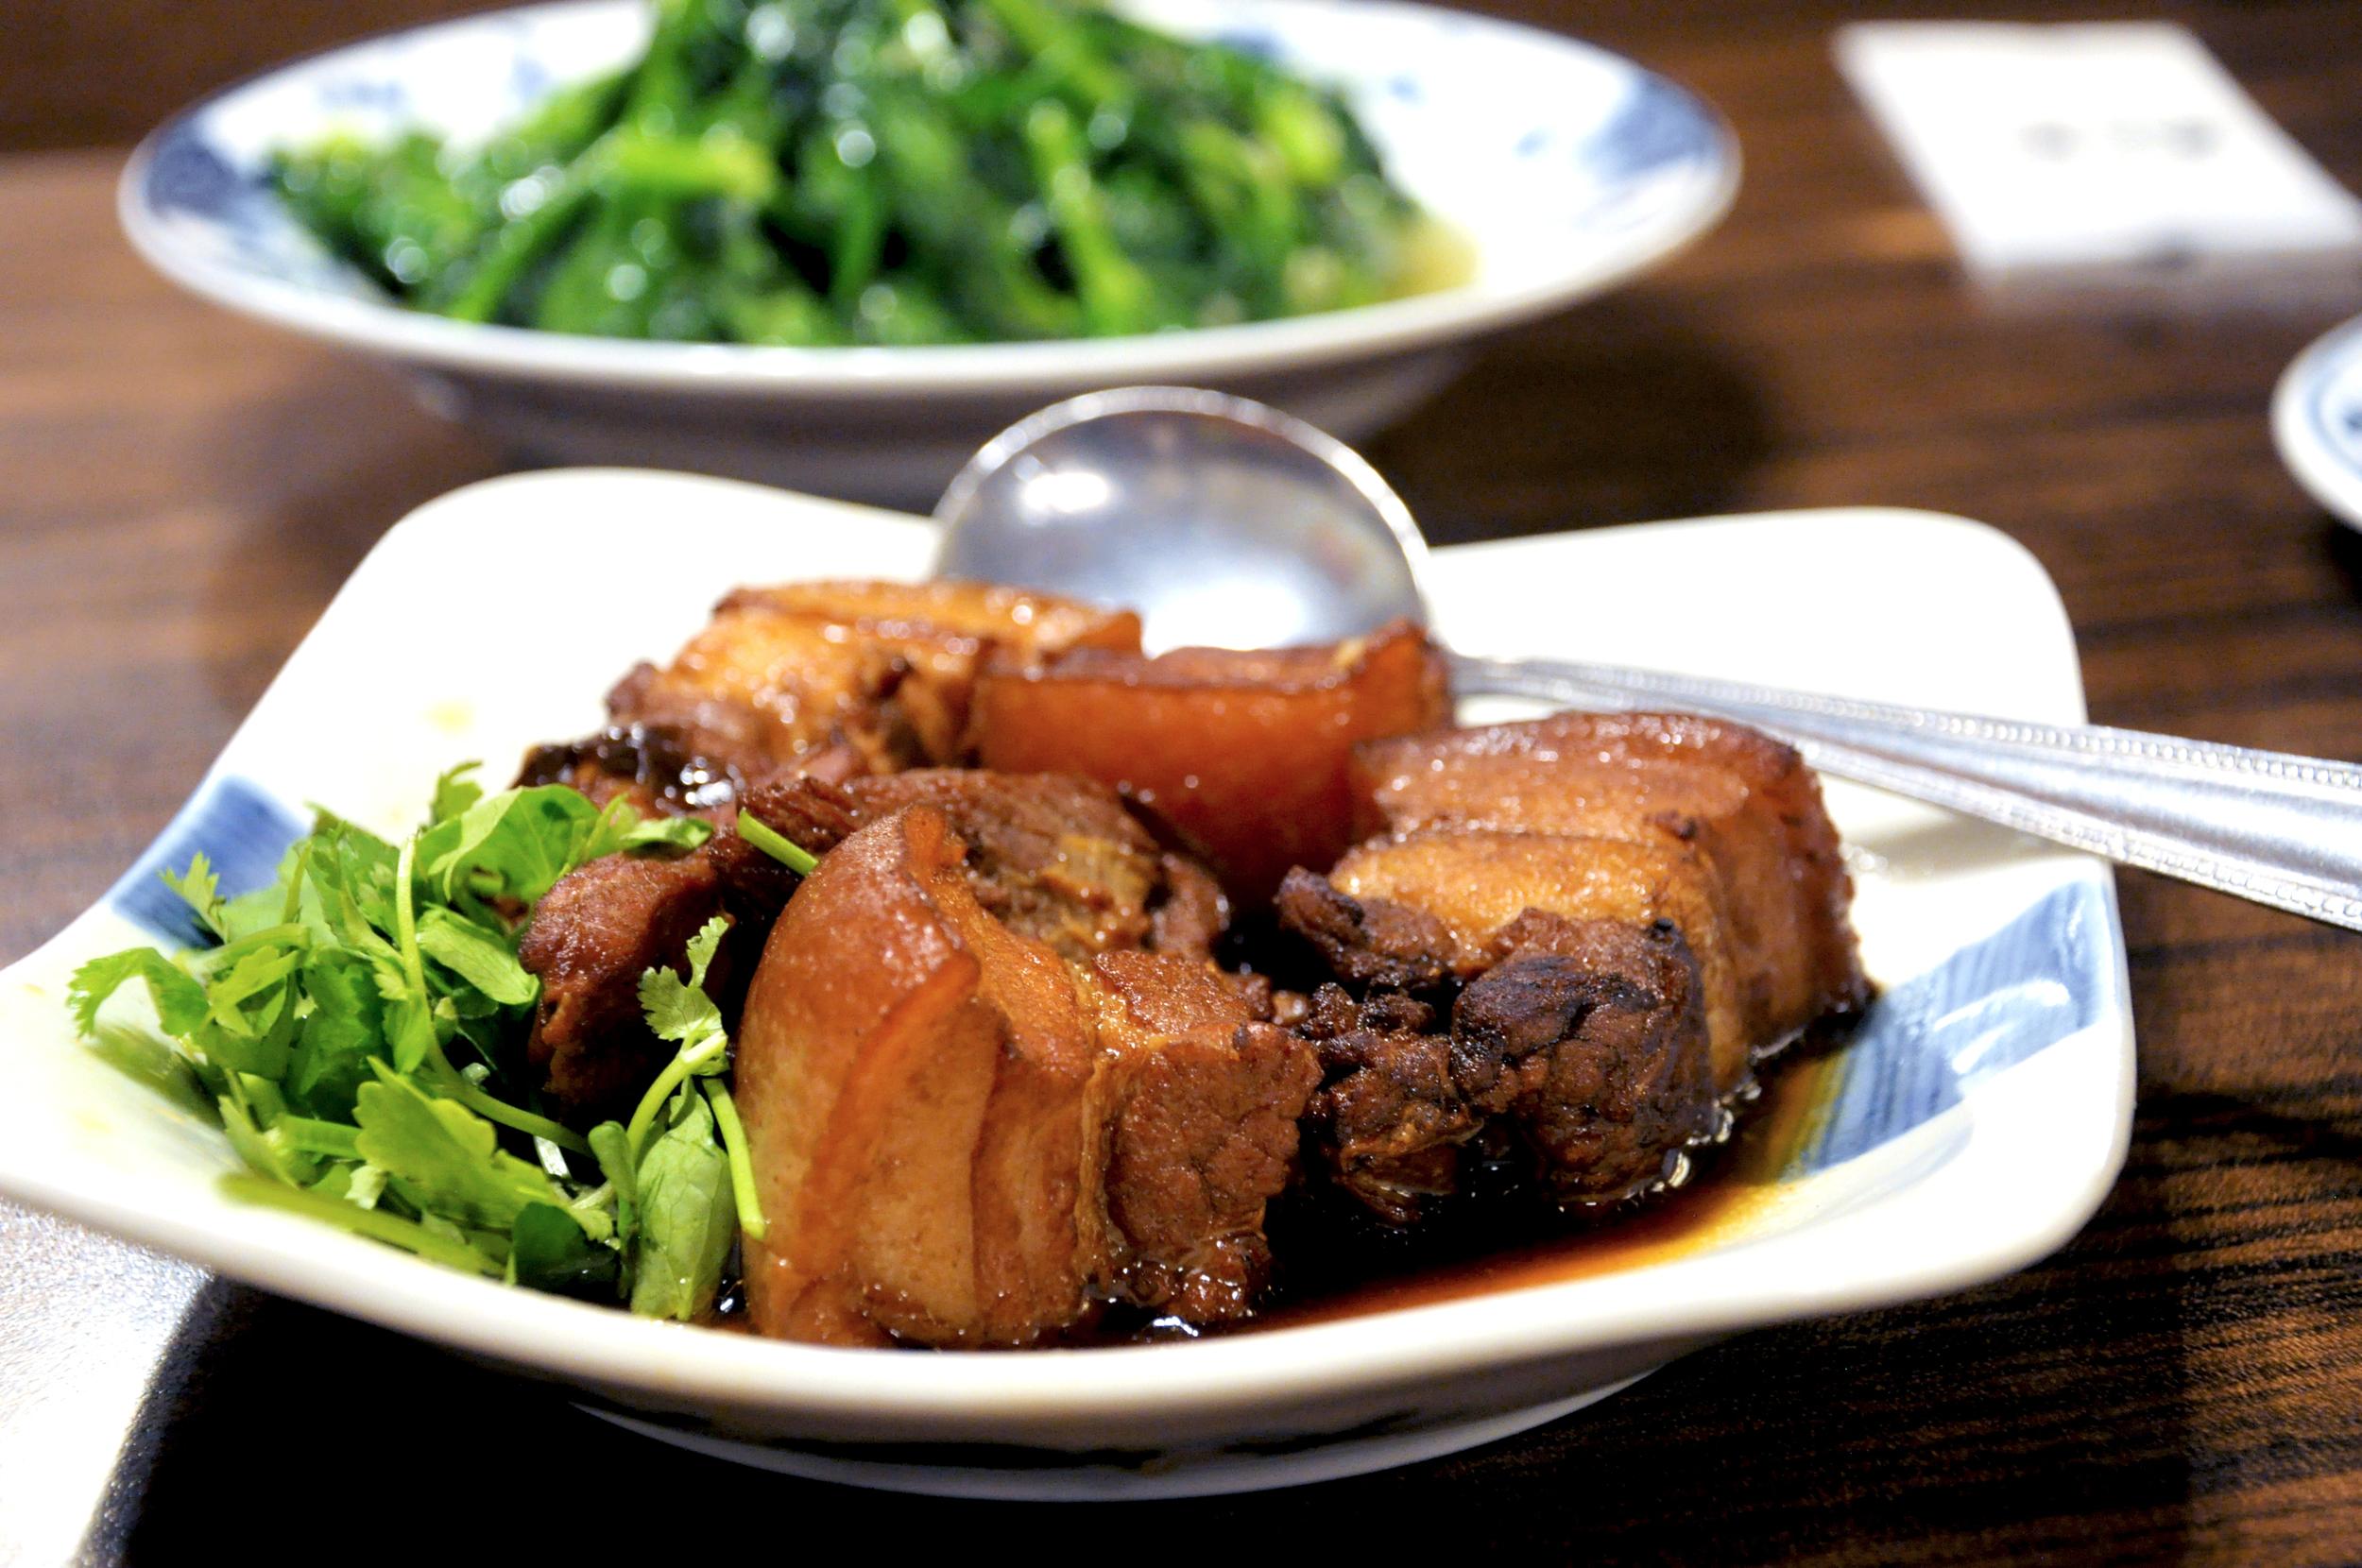 Braised pork at AoBa